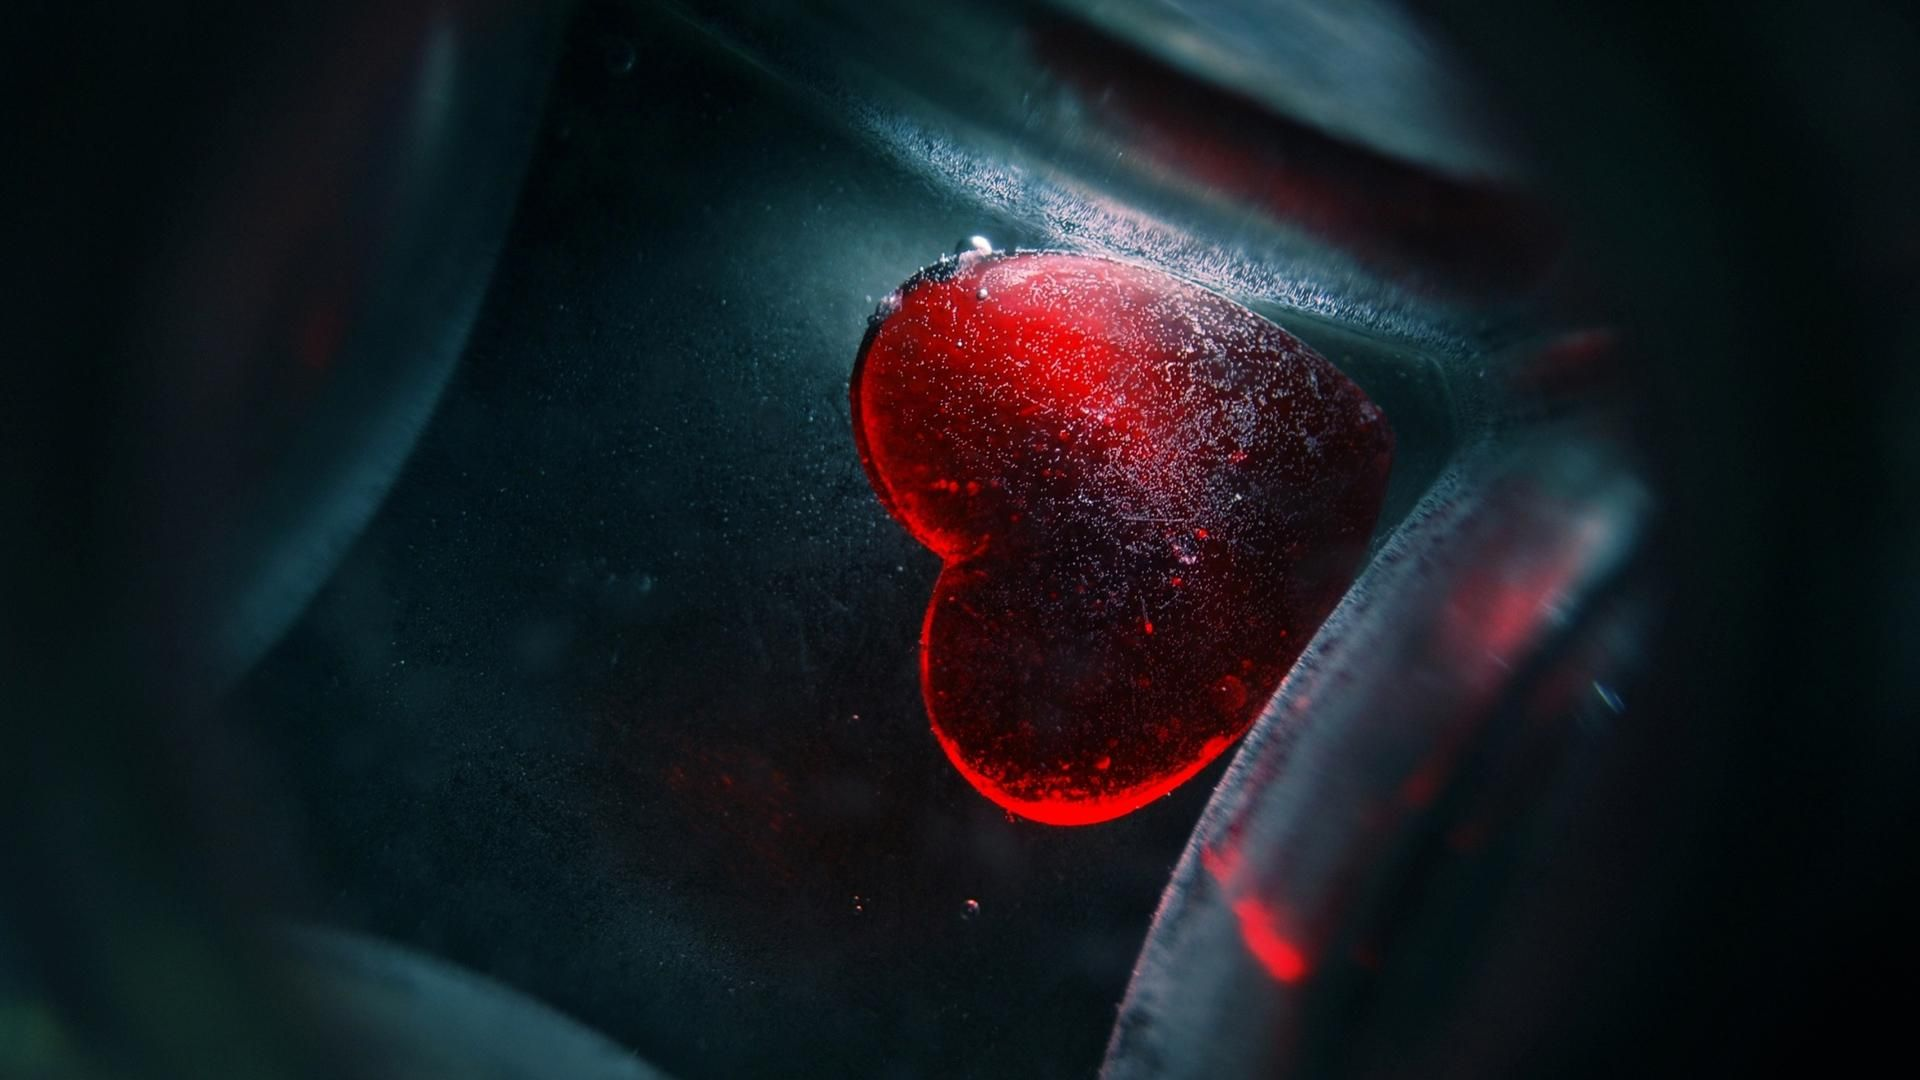 Download Love Background Images Hd Wallpaper Aa Heart Wallpaper